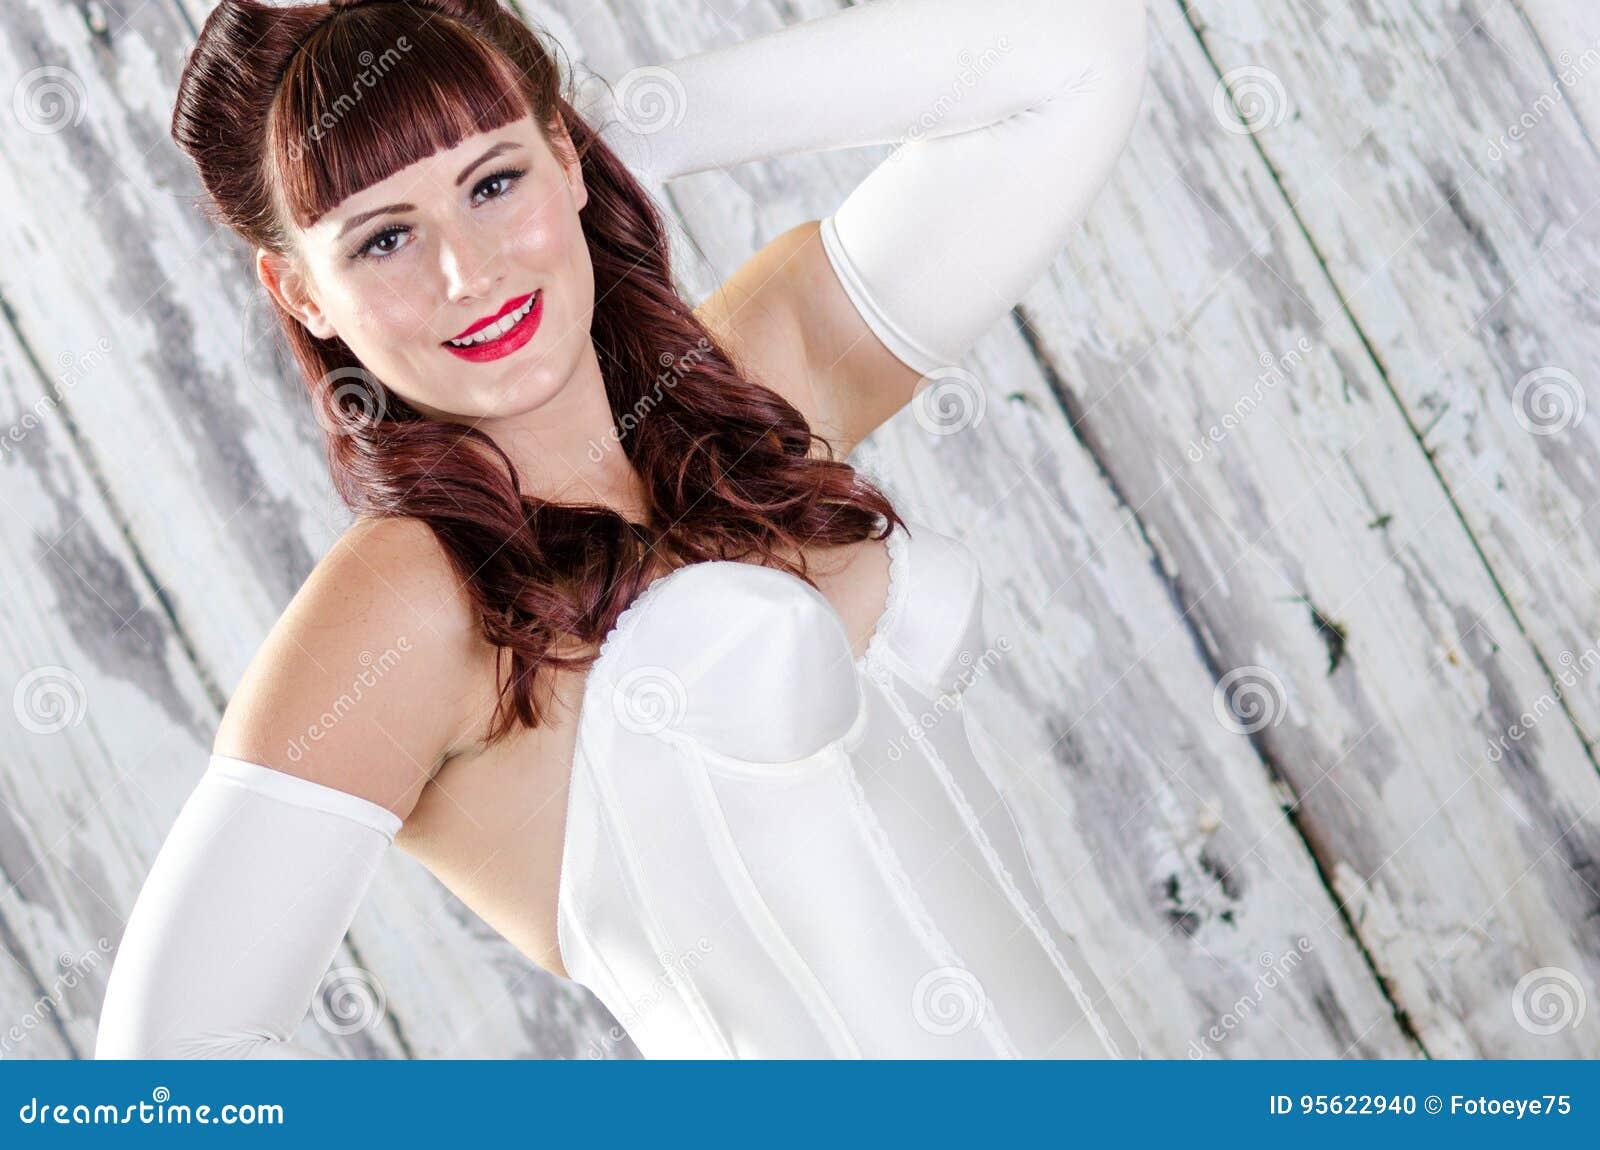 e9cd794db71 red hair 50s retro pinup boudoir woman in lingerie night gown. Model has  light soft skin